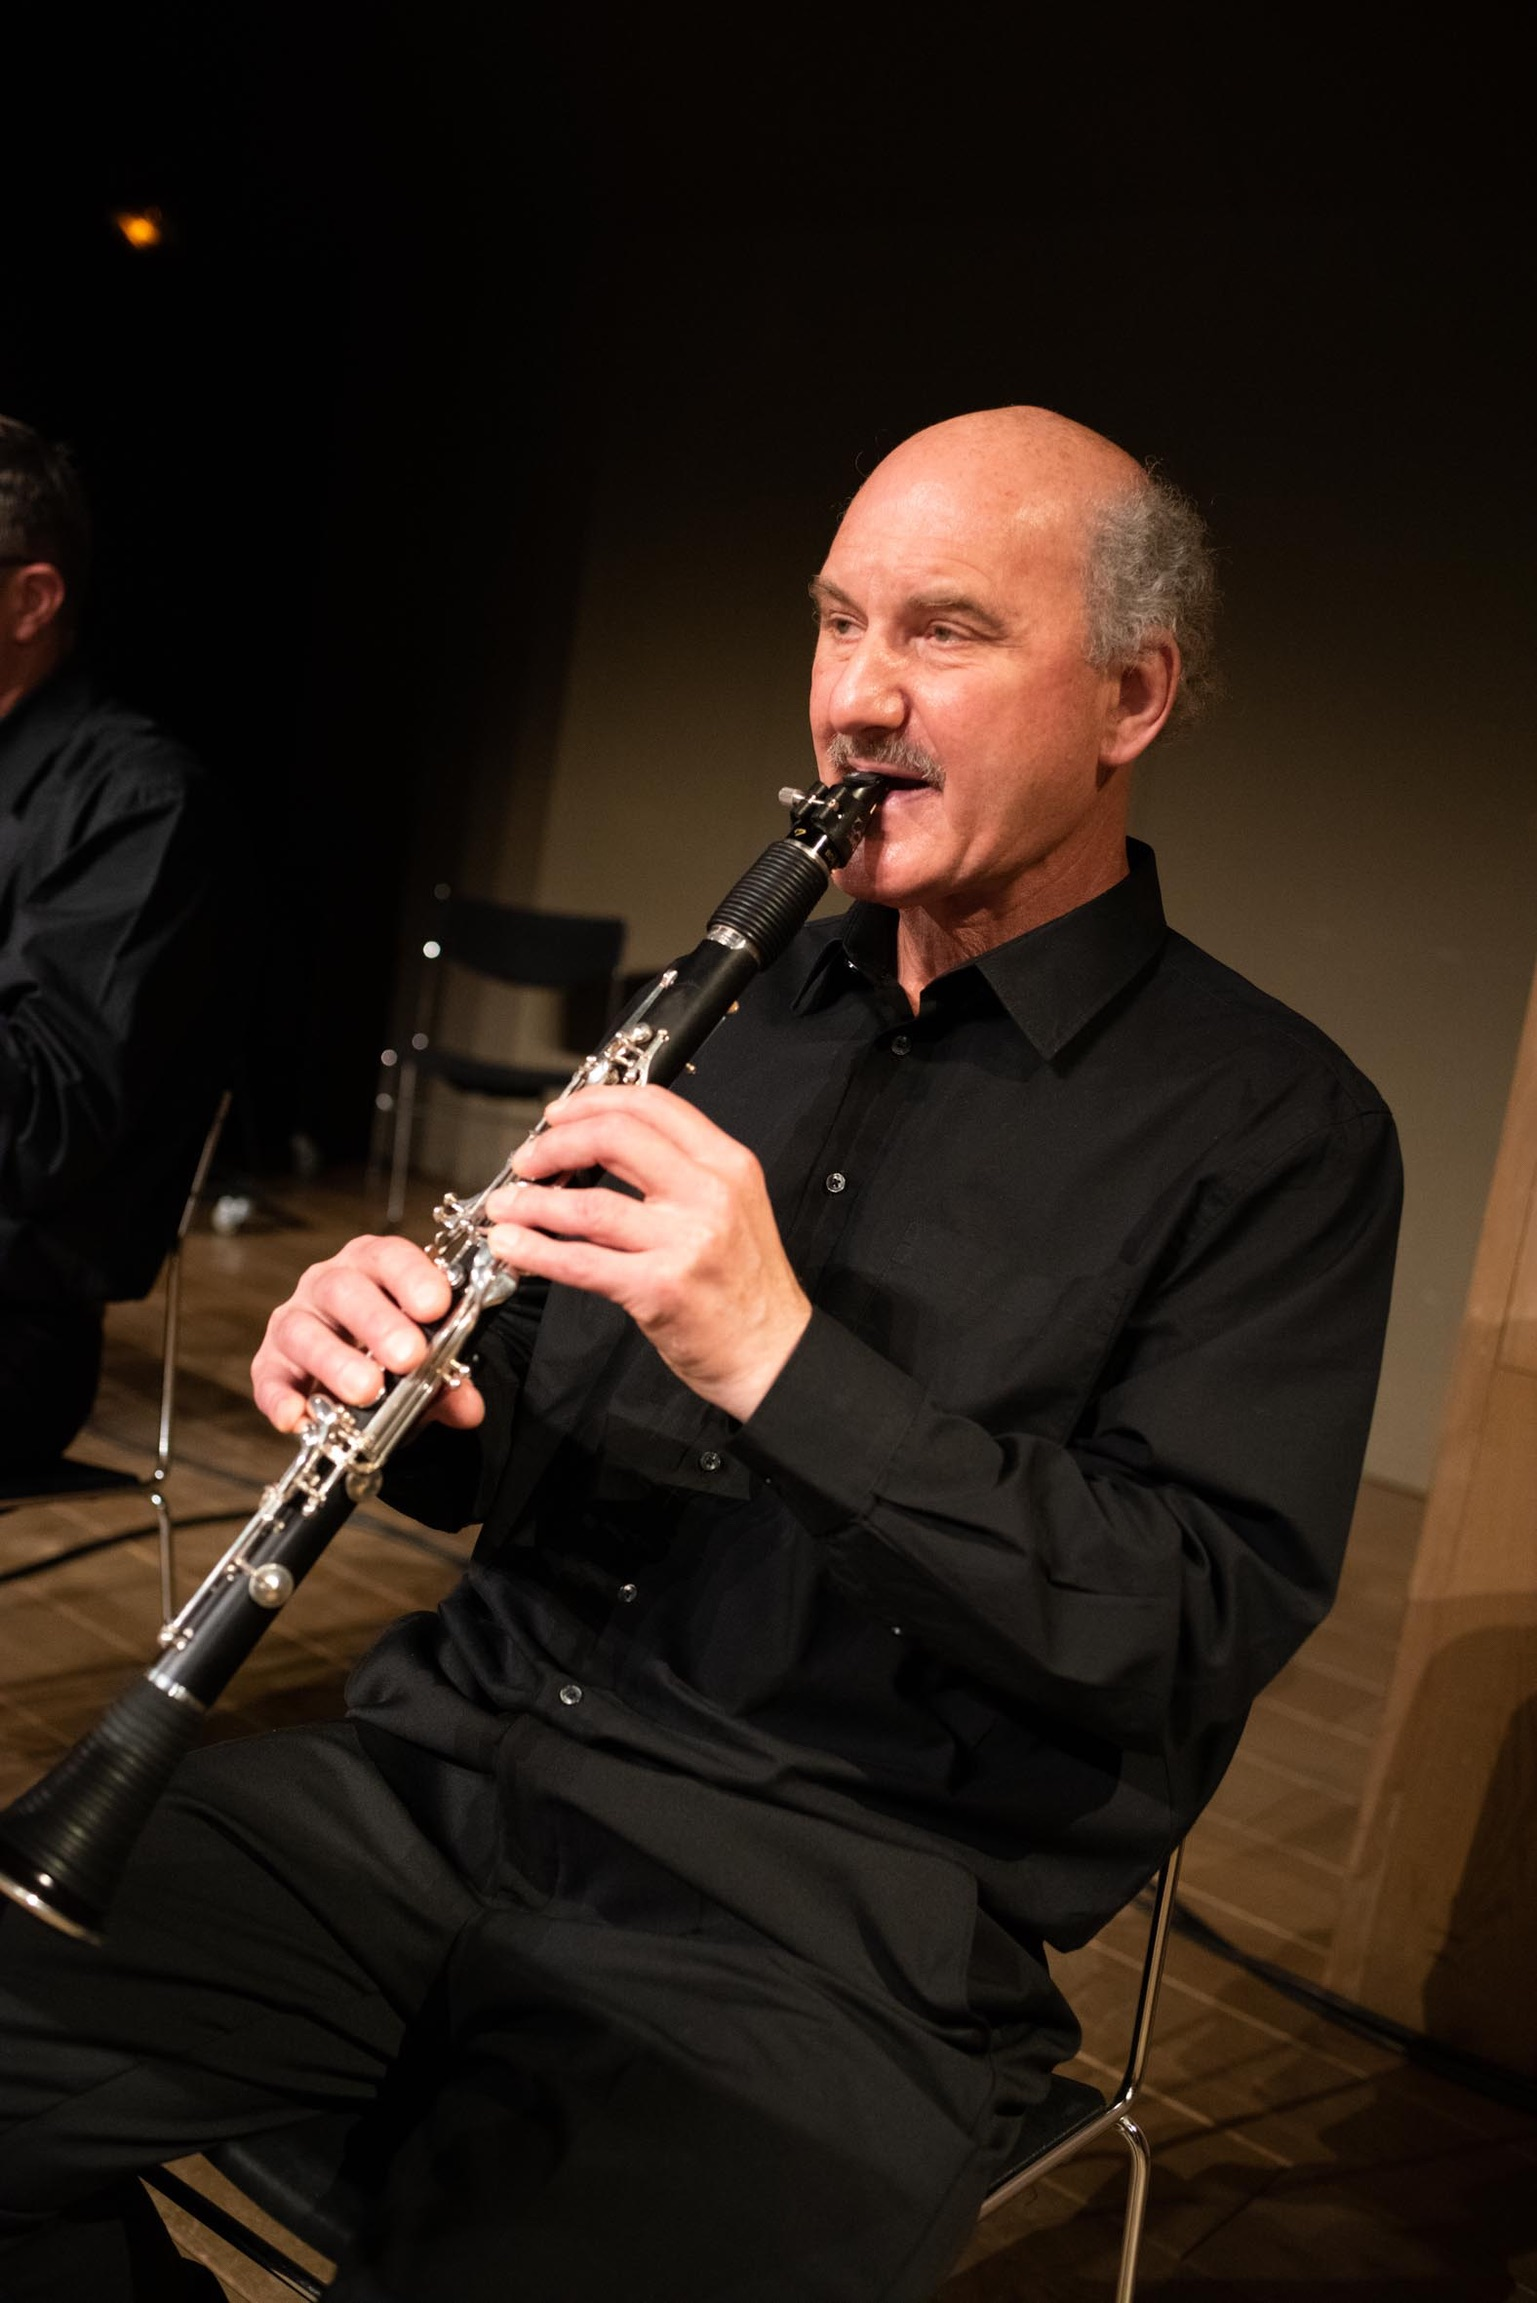 Pierre-Patrick LAURENT - Clarinette